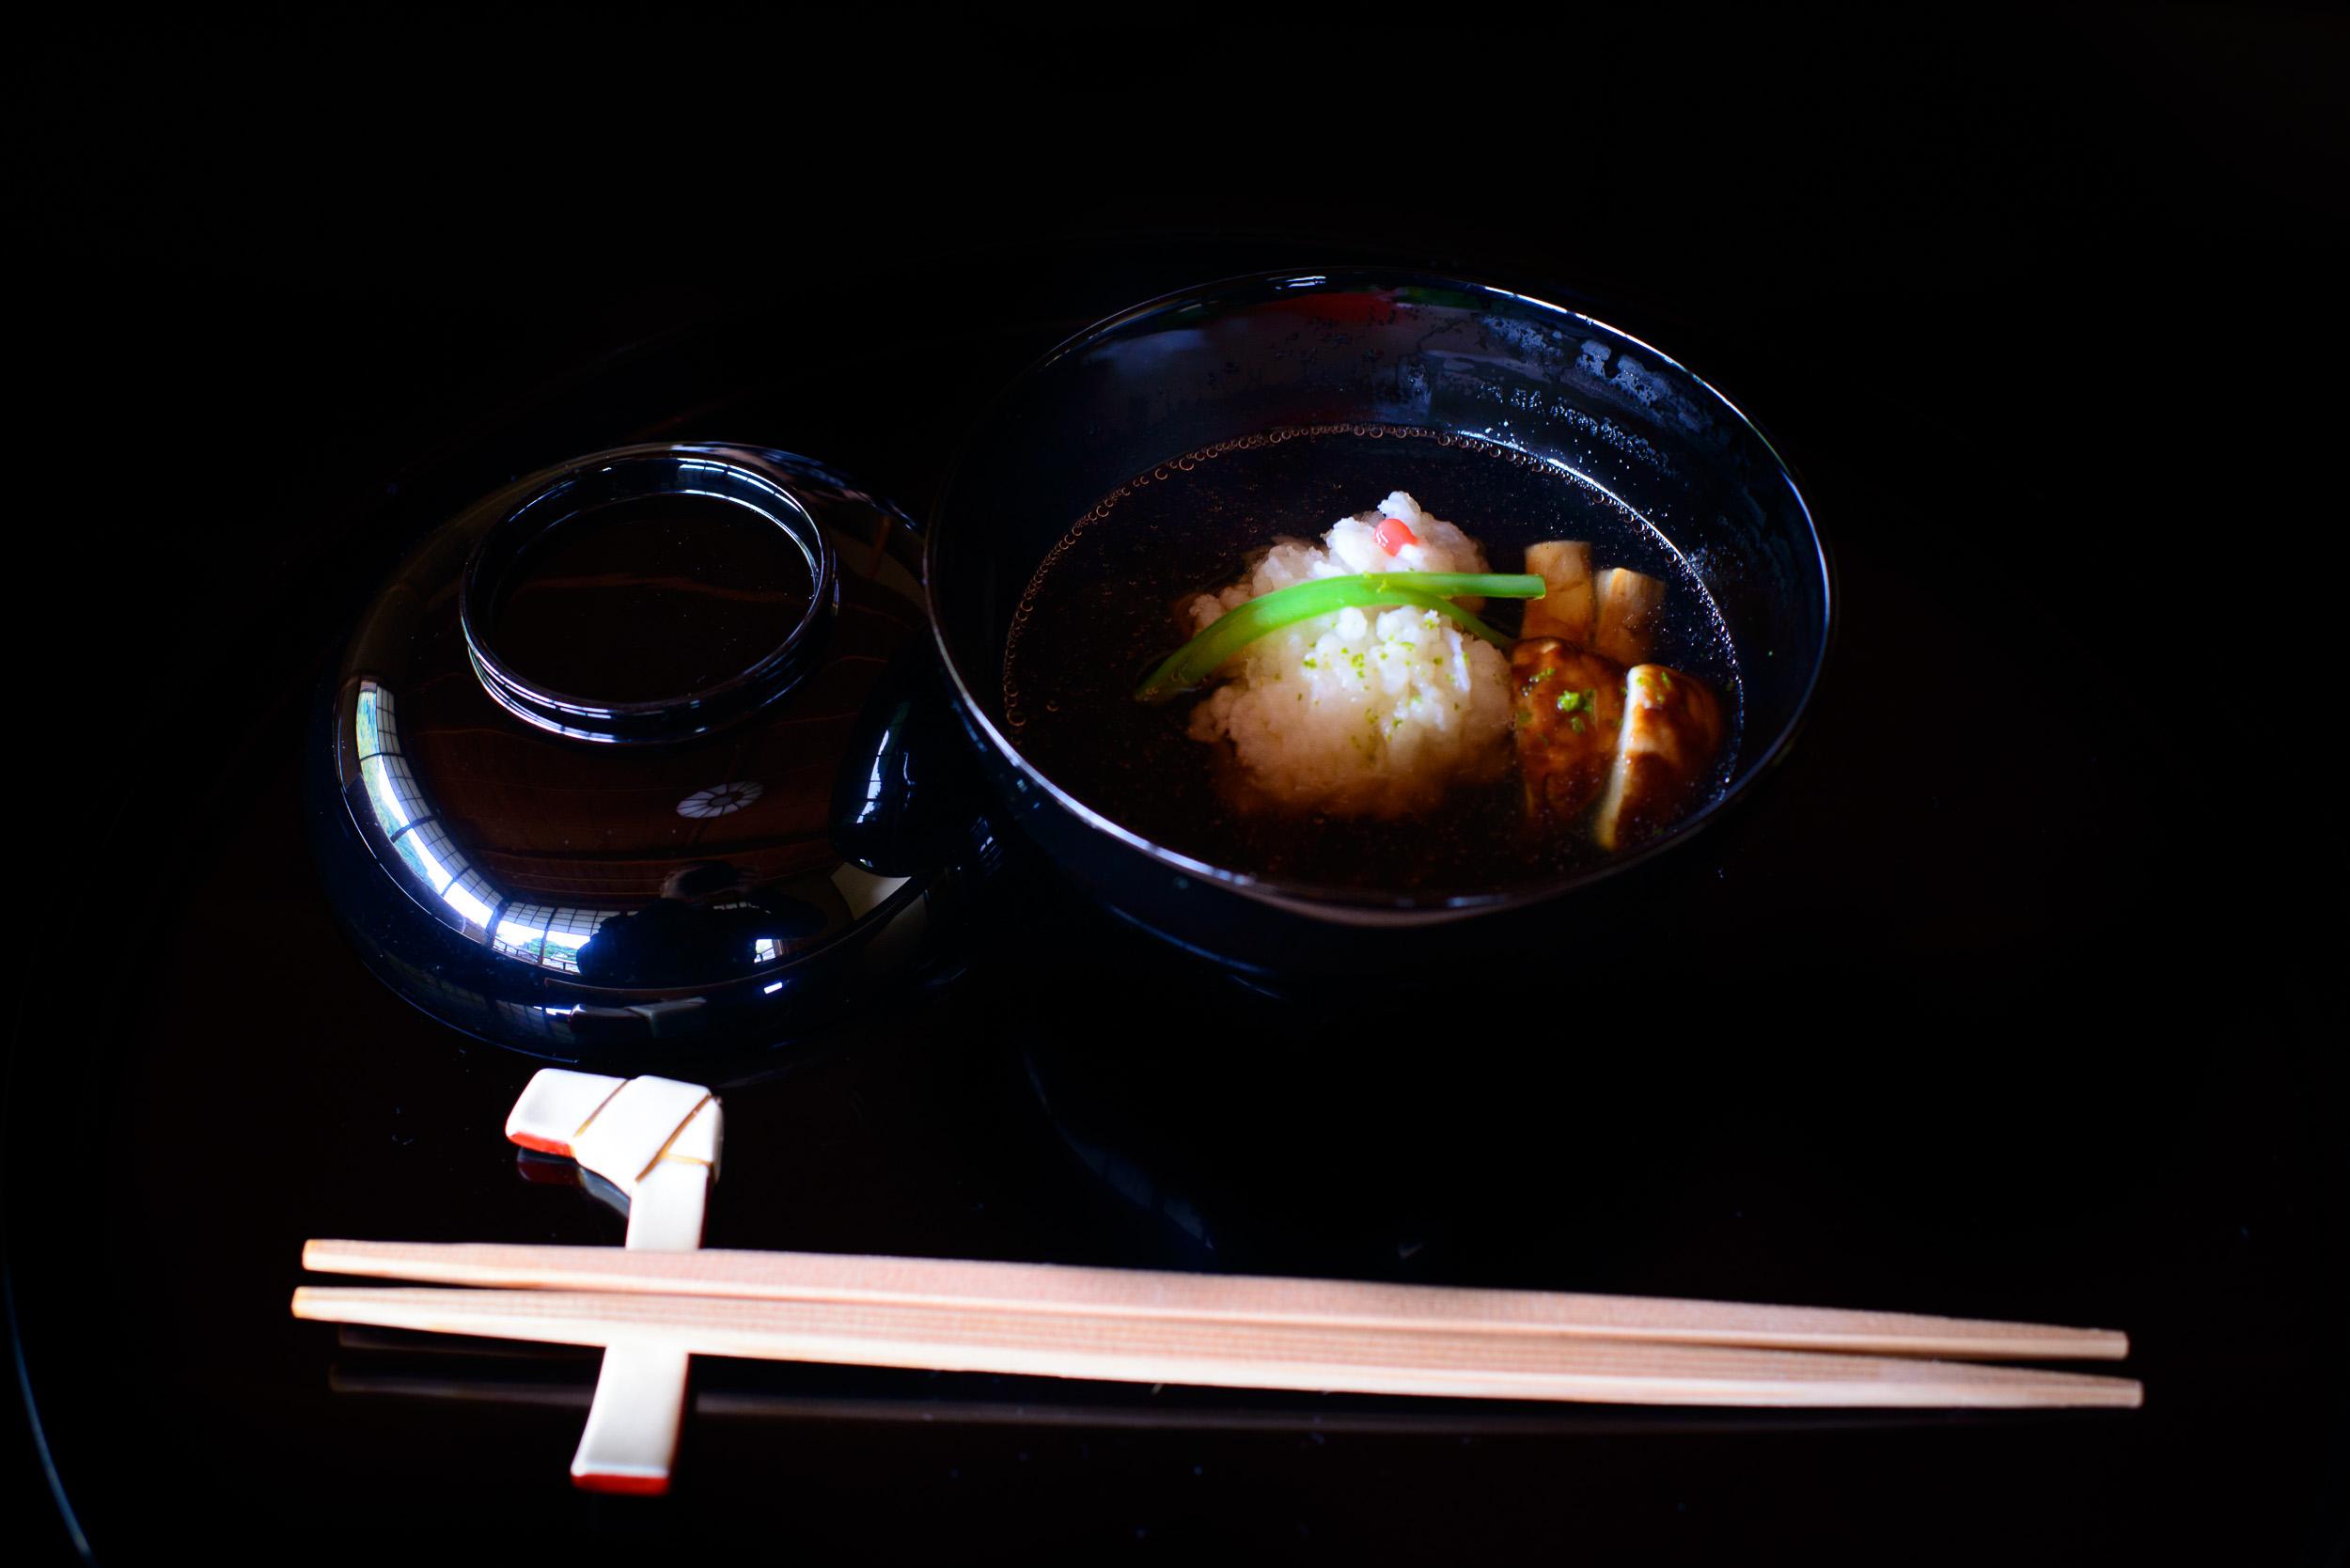 3rd Course: Clear soup of pike conger (hamo) and matsutake mushr